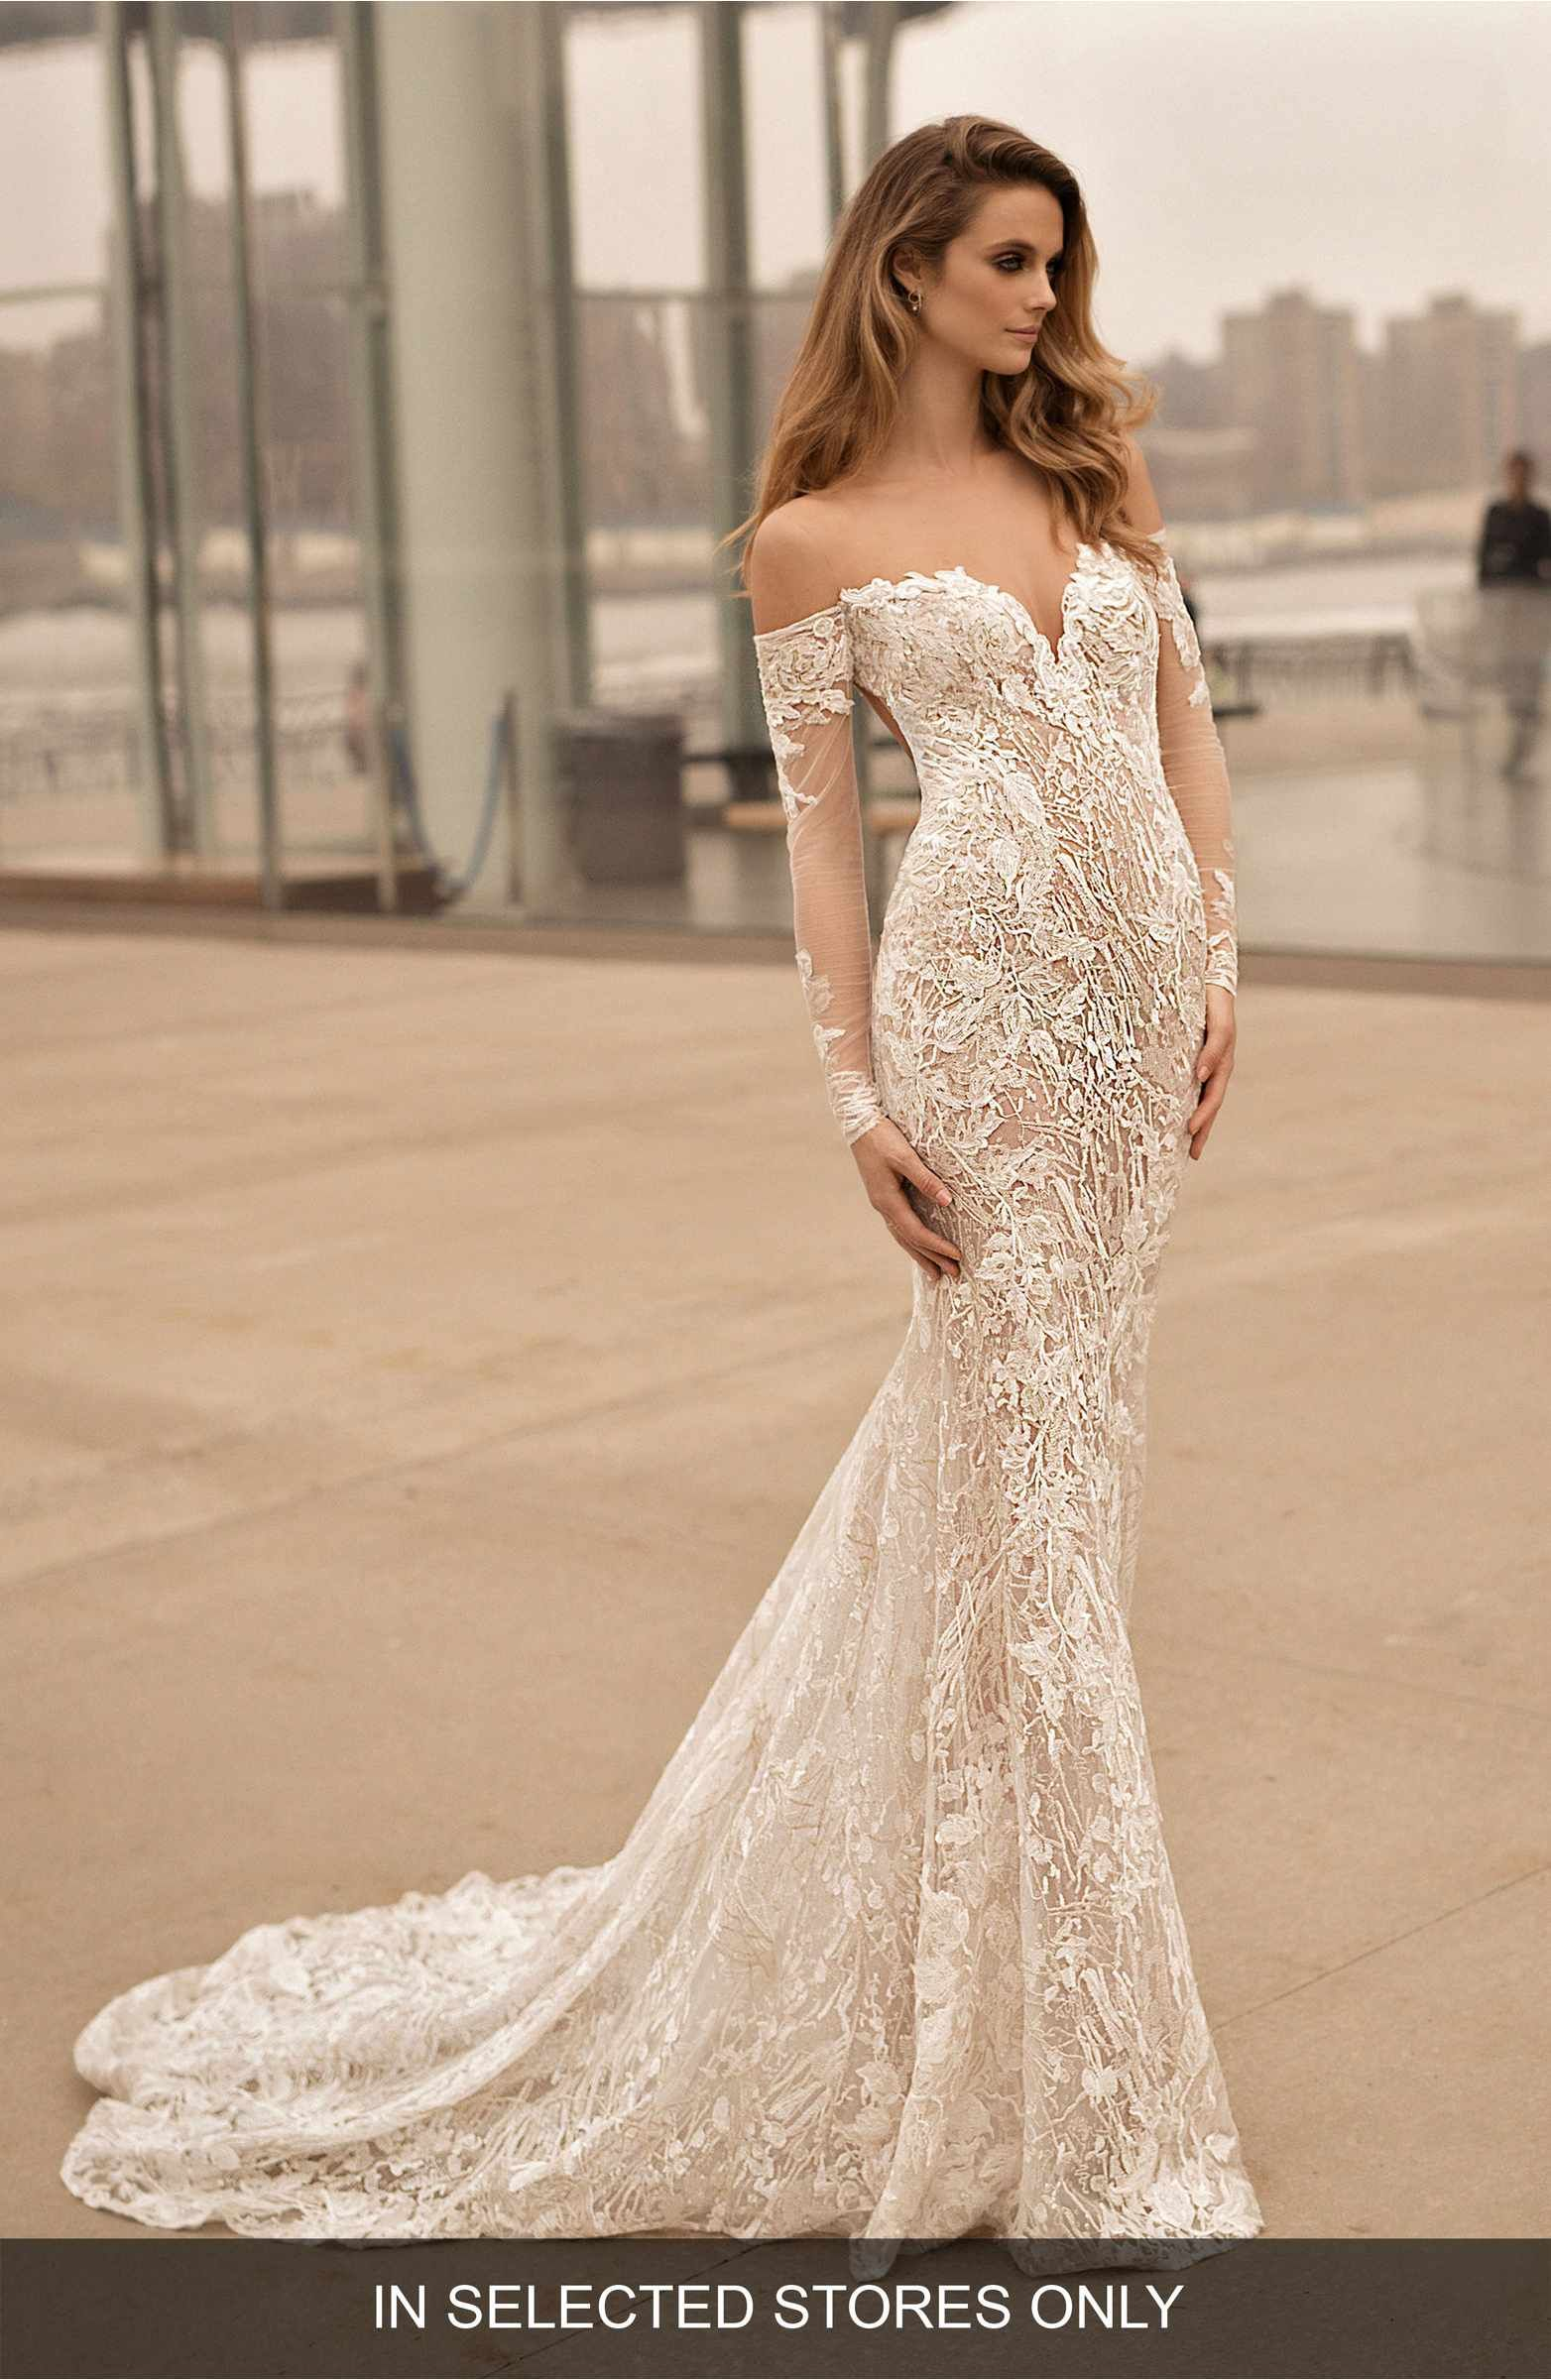 Off the shoulder lace mermaid wedding dress  Main Image  Berta Long Sleeve Illusion Off the Shoulder Mermaid